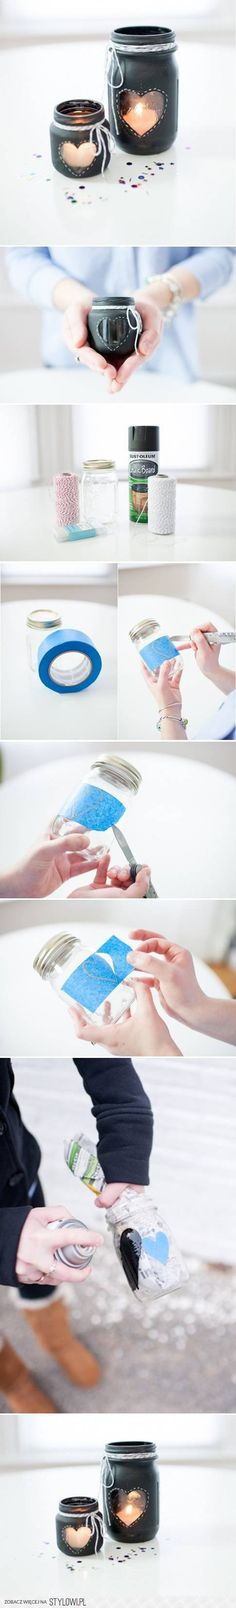 DIY Glass Jar Candlestick DIY Projects | UsefulDIY.com